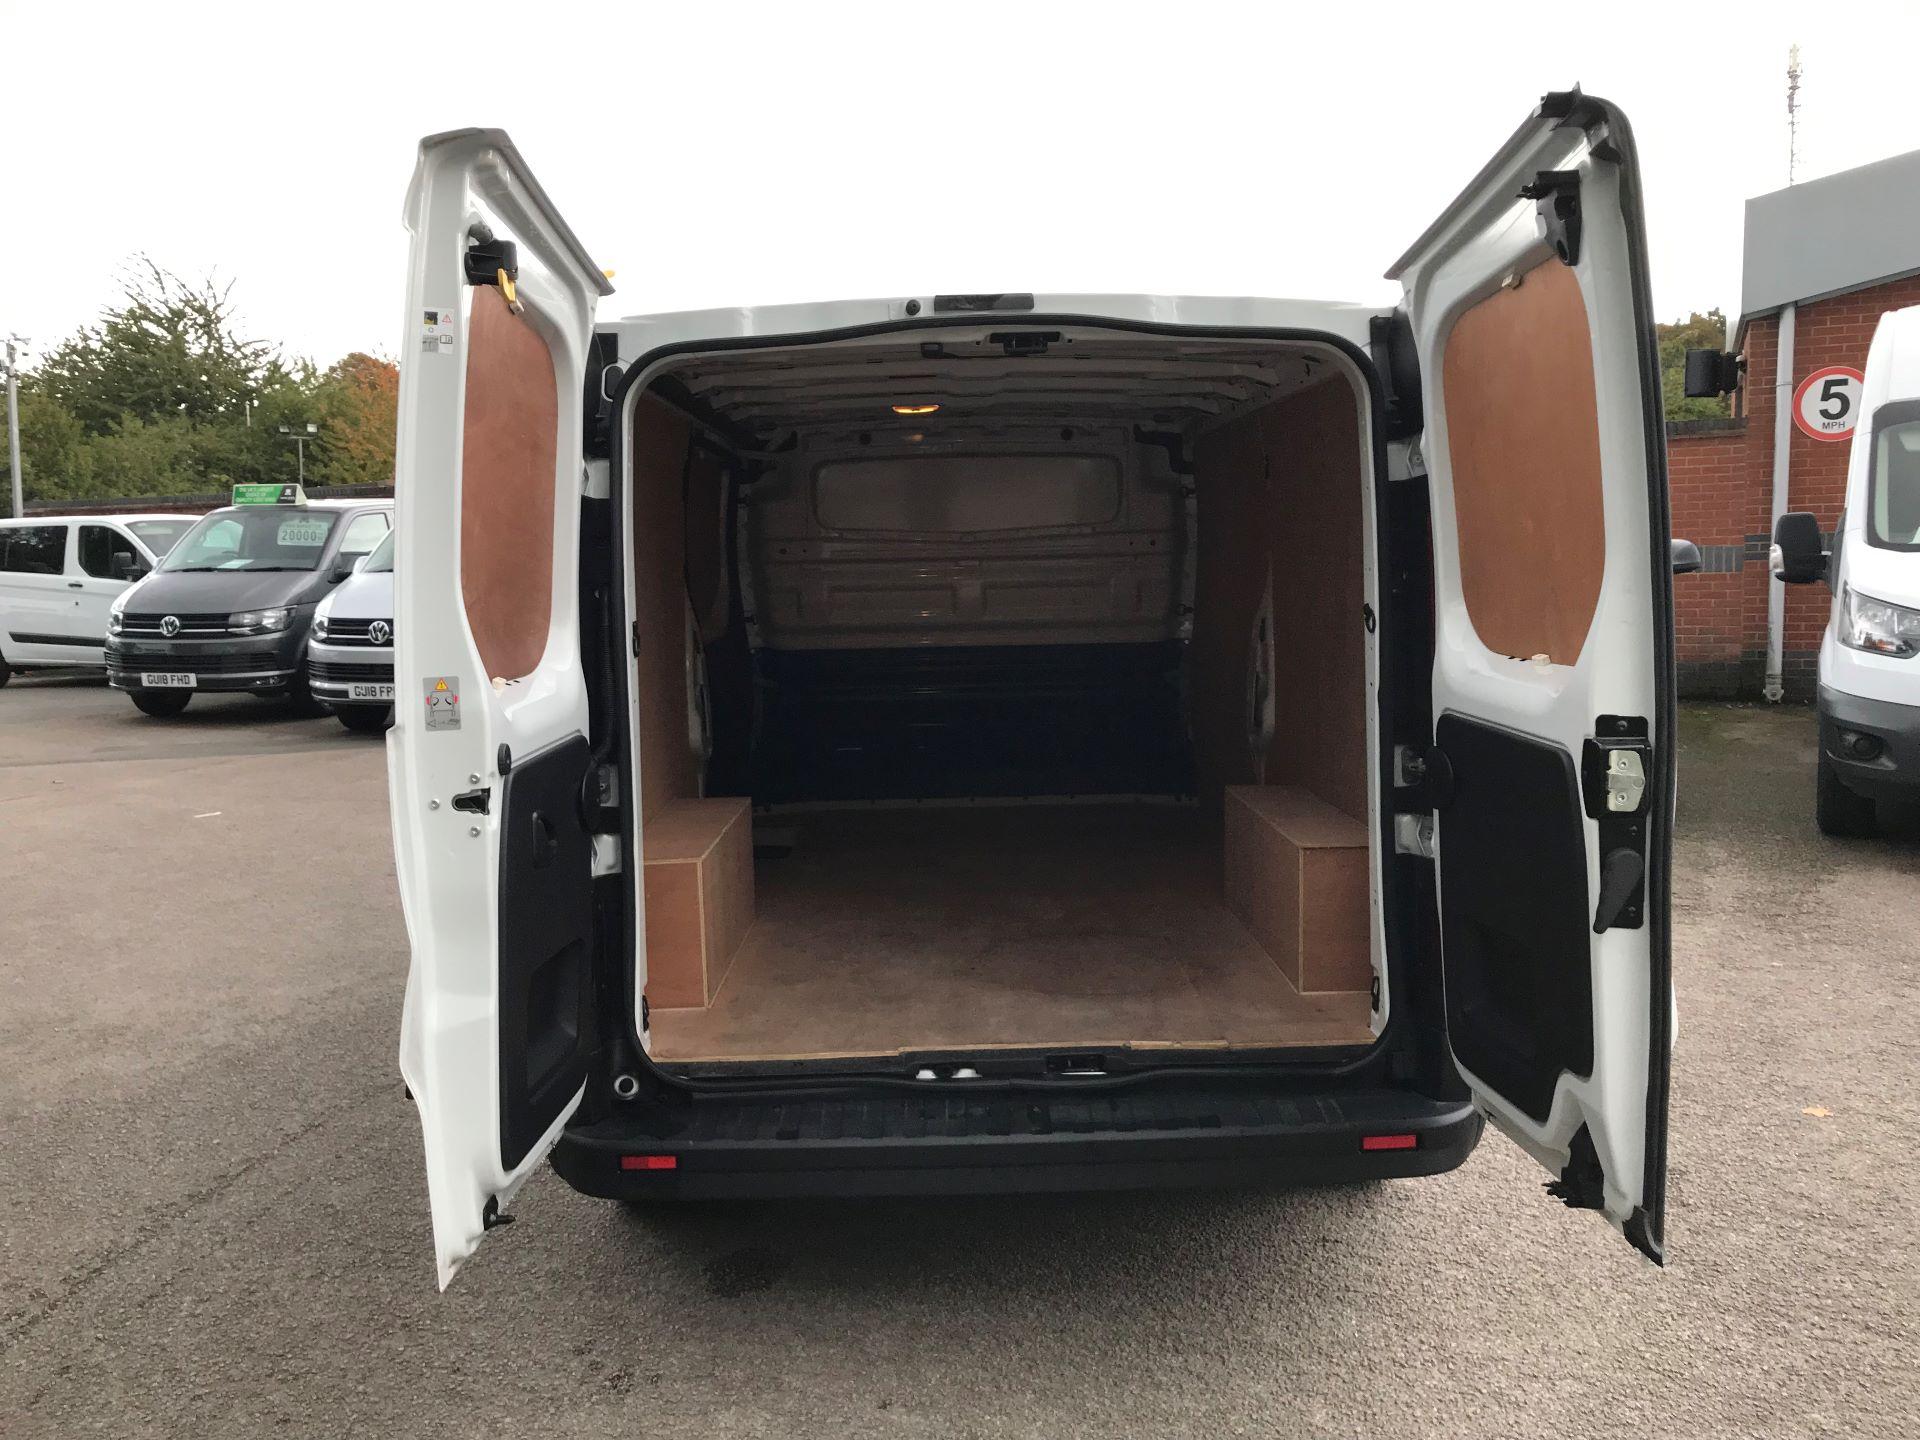 2017 Vauxhall Vivaro L2 H1 2900 1.6CDTI 120PS EURO 6 (DY67MXD) Image 11